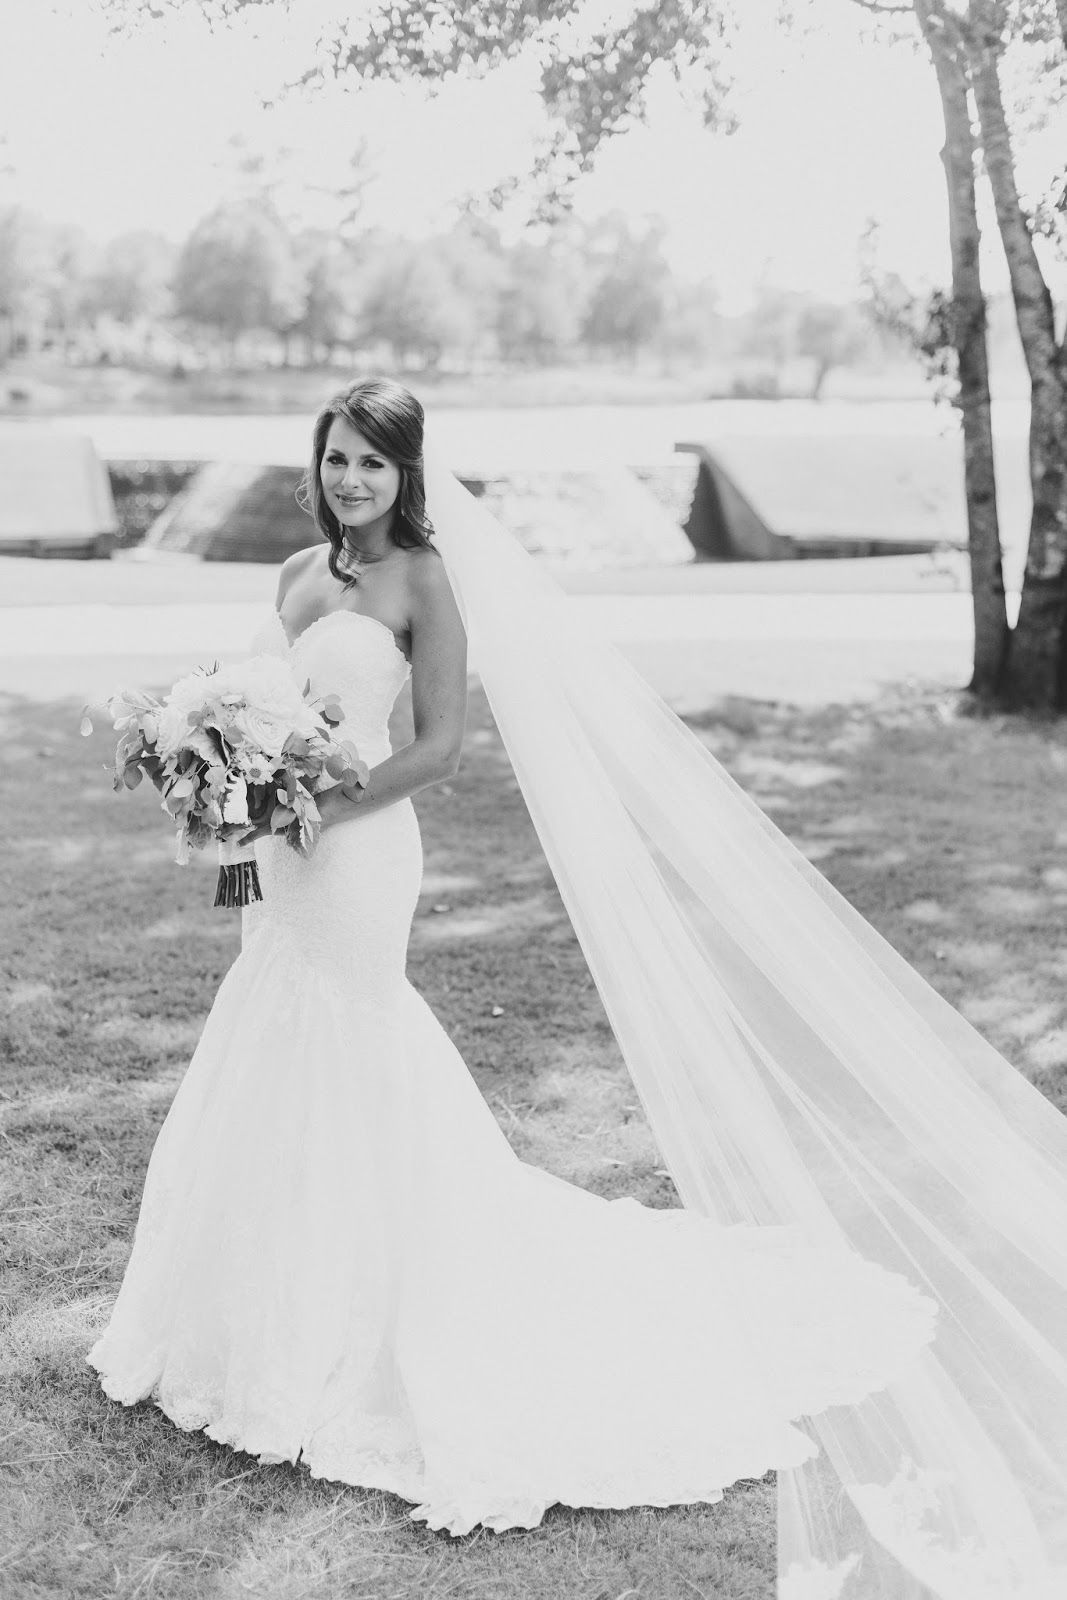 Southern style wedding dresses  The Wedding Ceremony u Bridal Party  Lace wedding dresses Lace